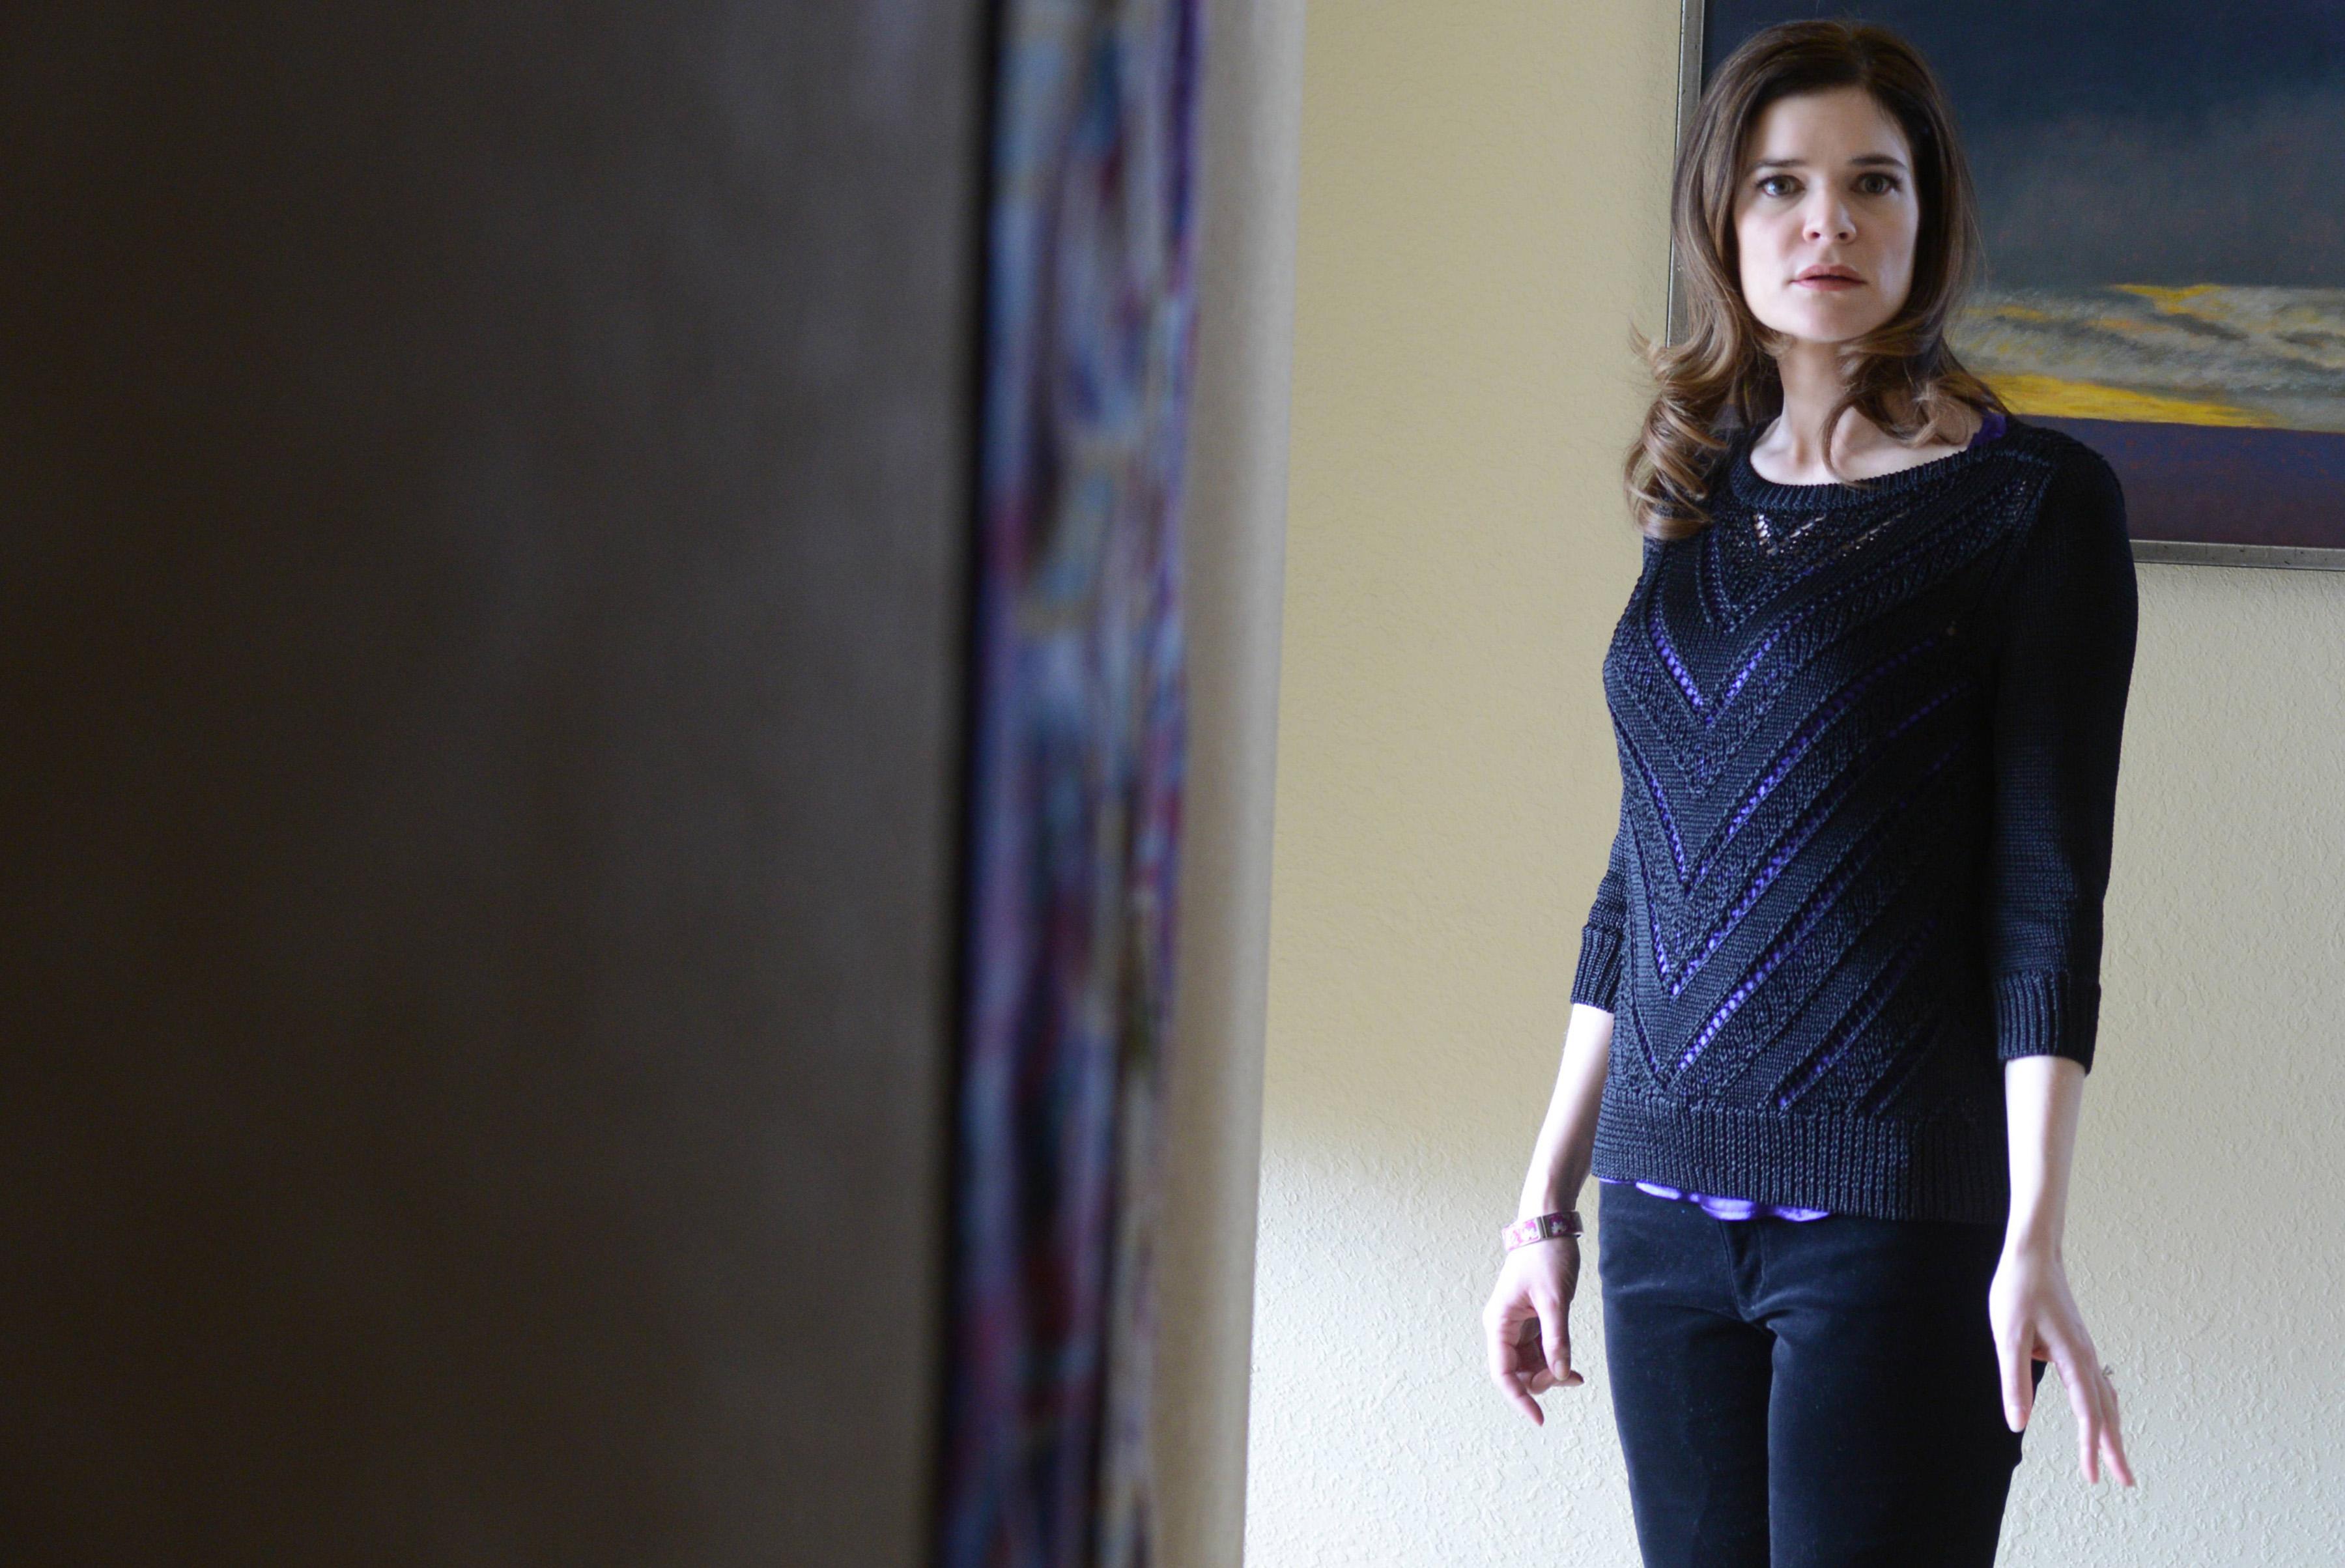 Betsy Brandt as Marie Schrader in Breaking Bad Season 5, Episode 12